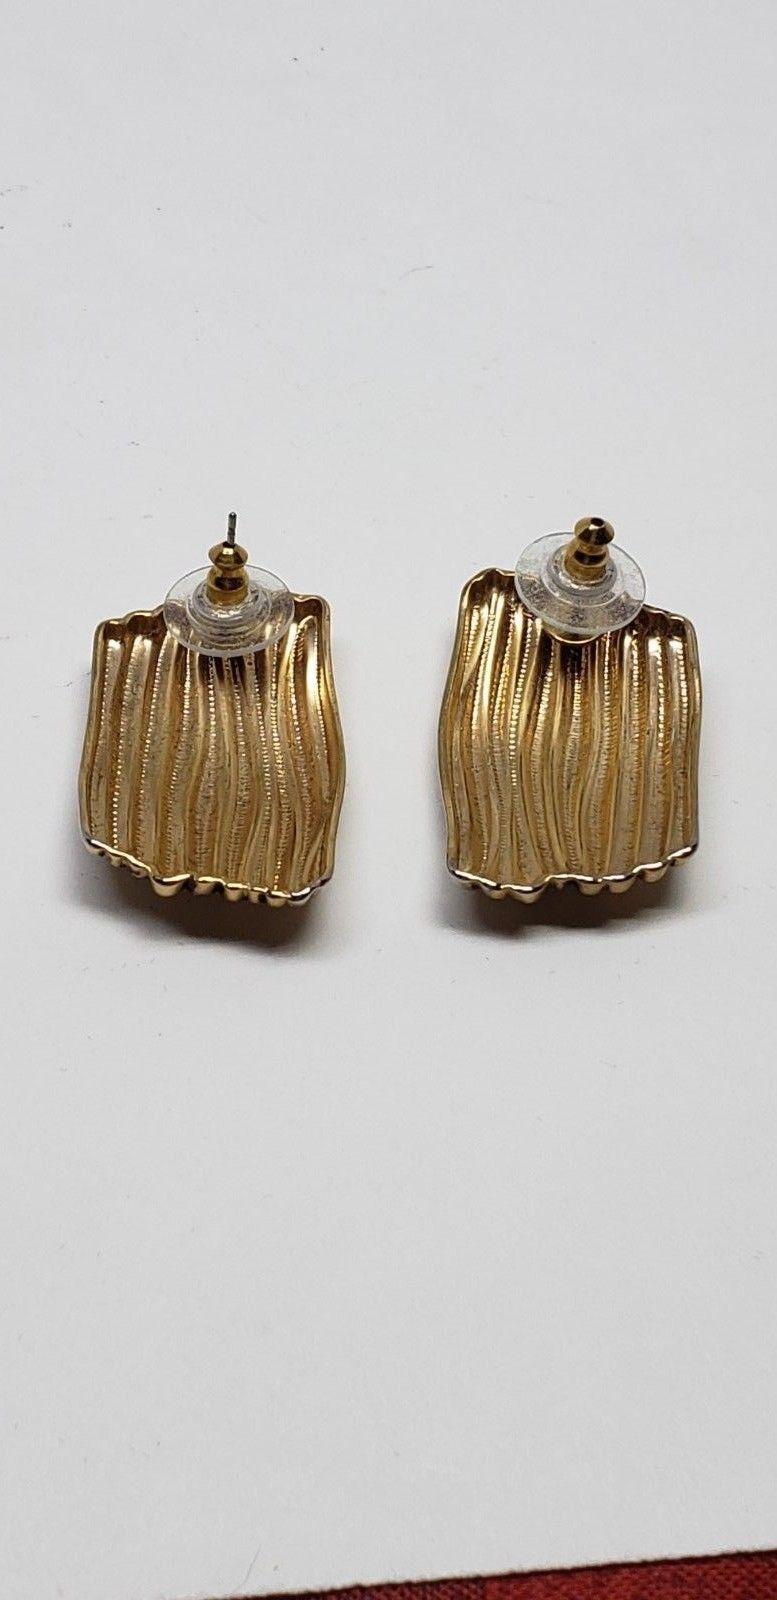 Abstract Wavy Earrings Pierced Vintage Gold Tone